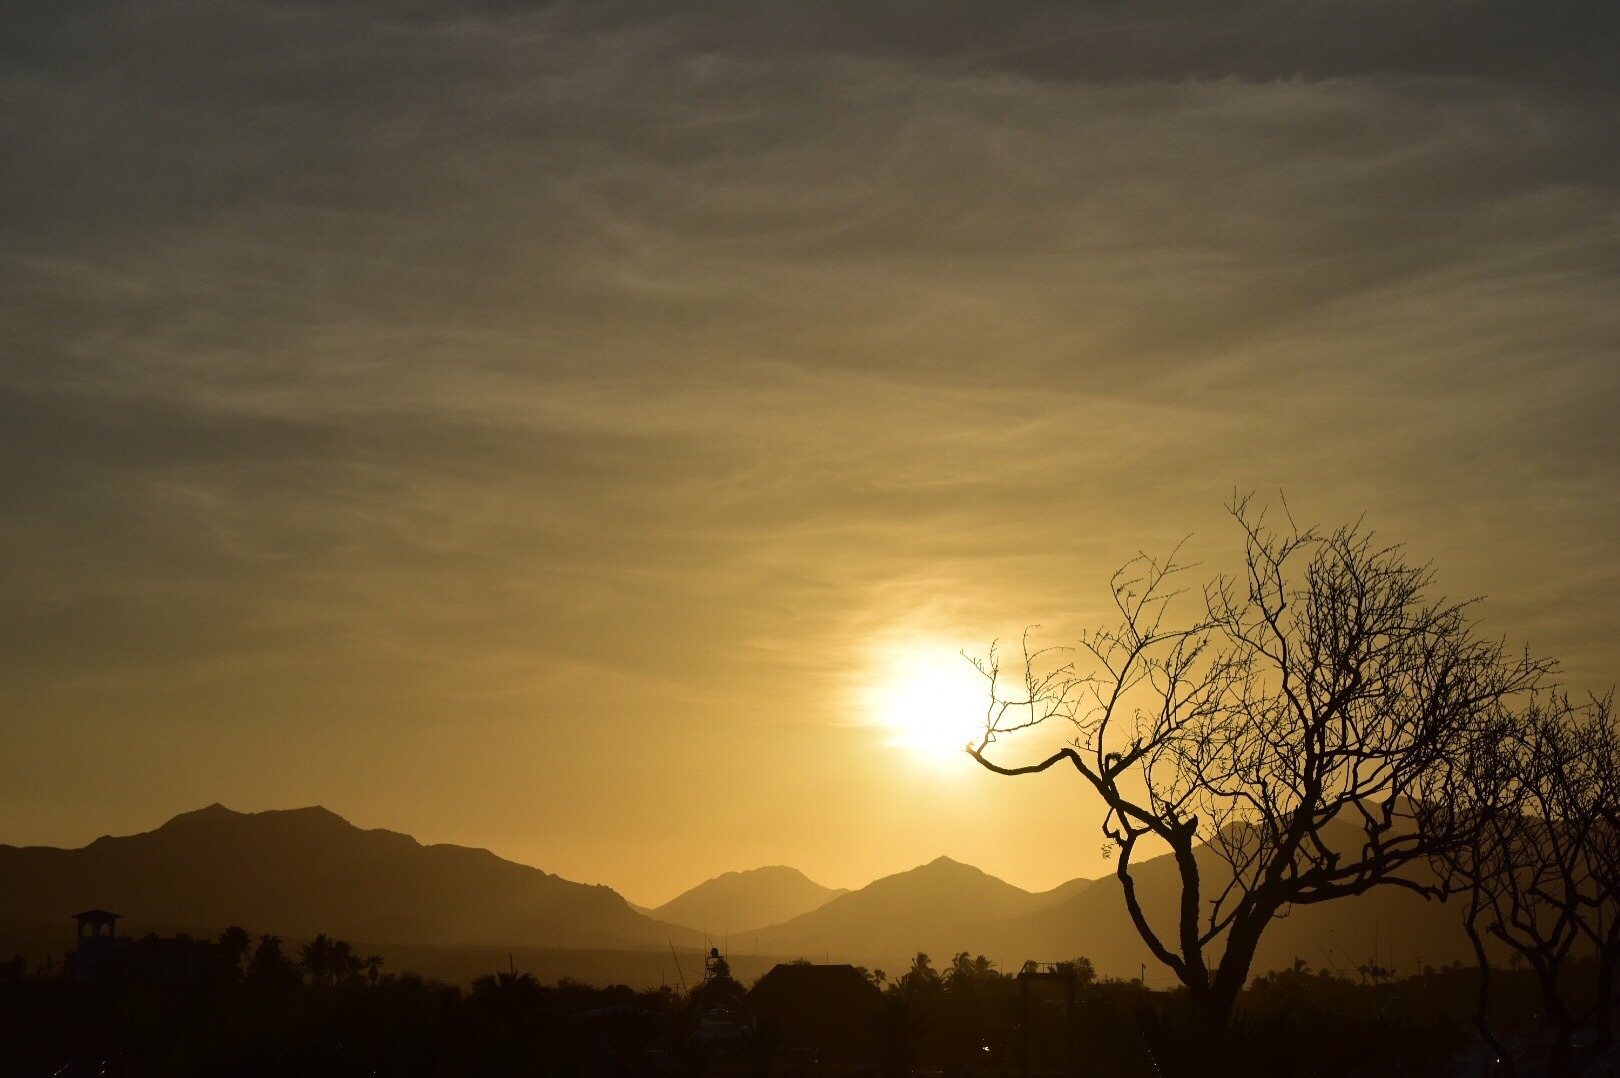 Yellow Sunset by Natashia Artz